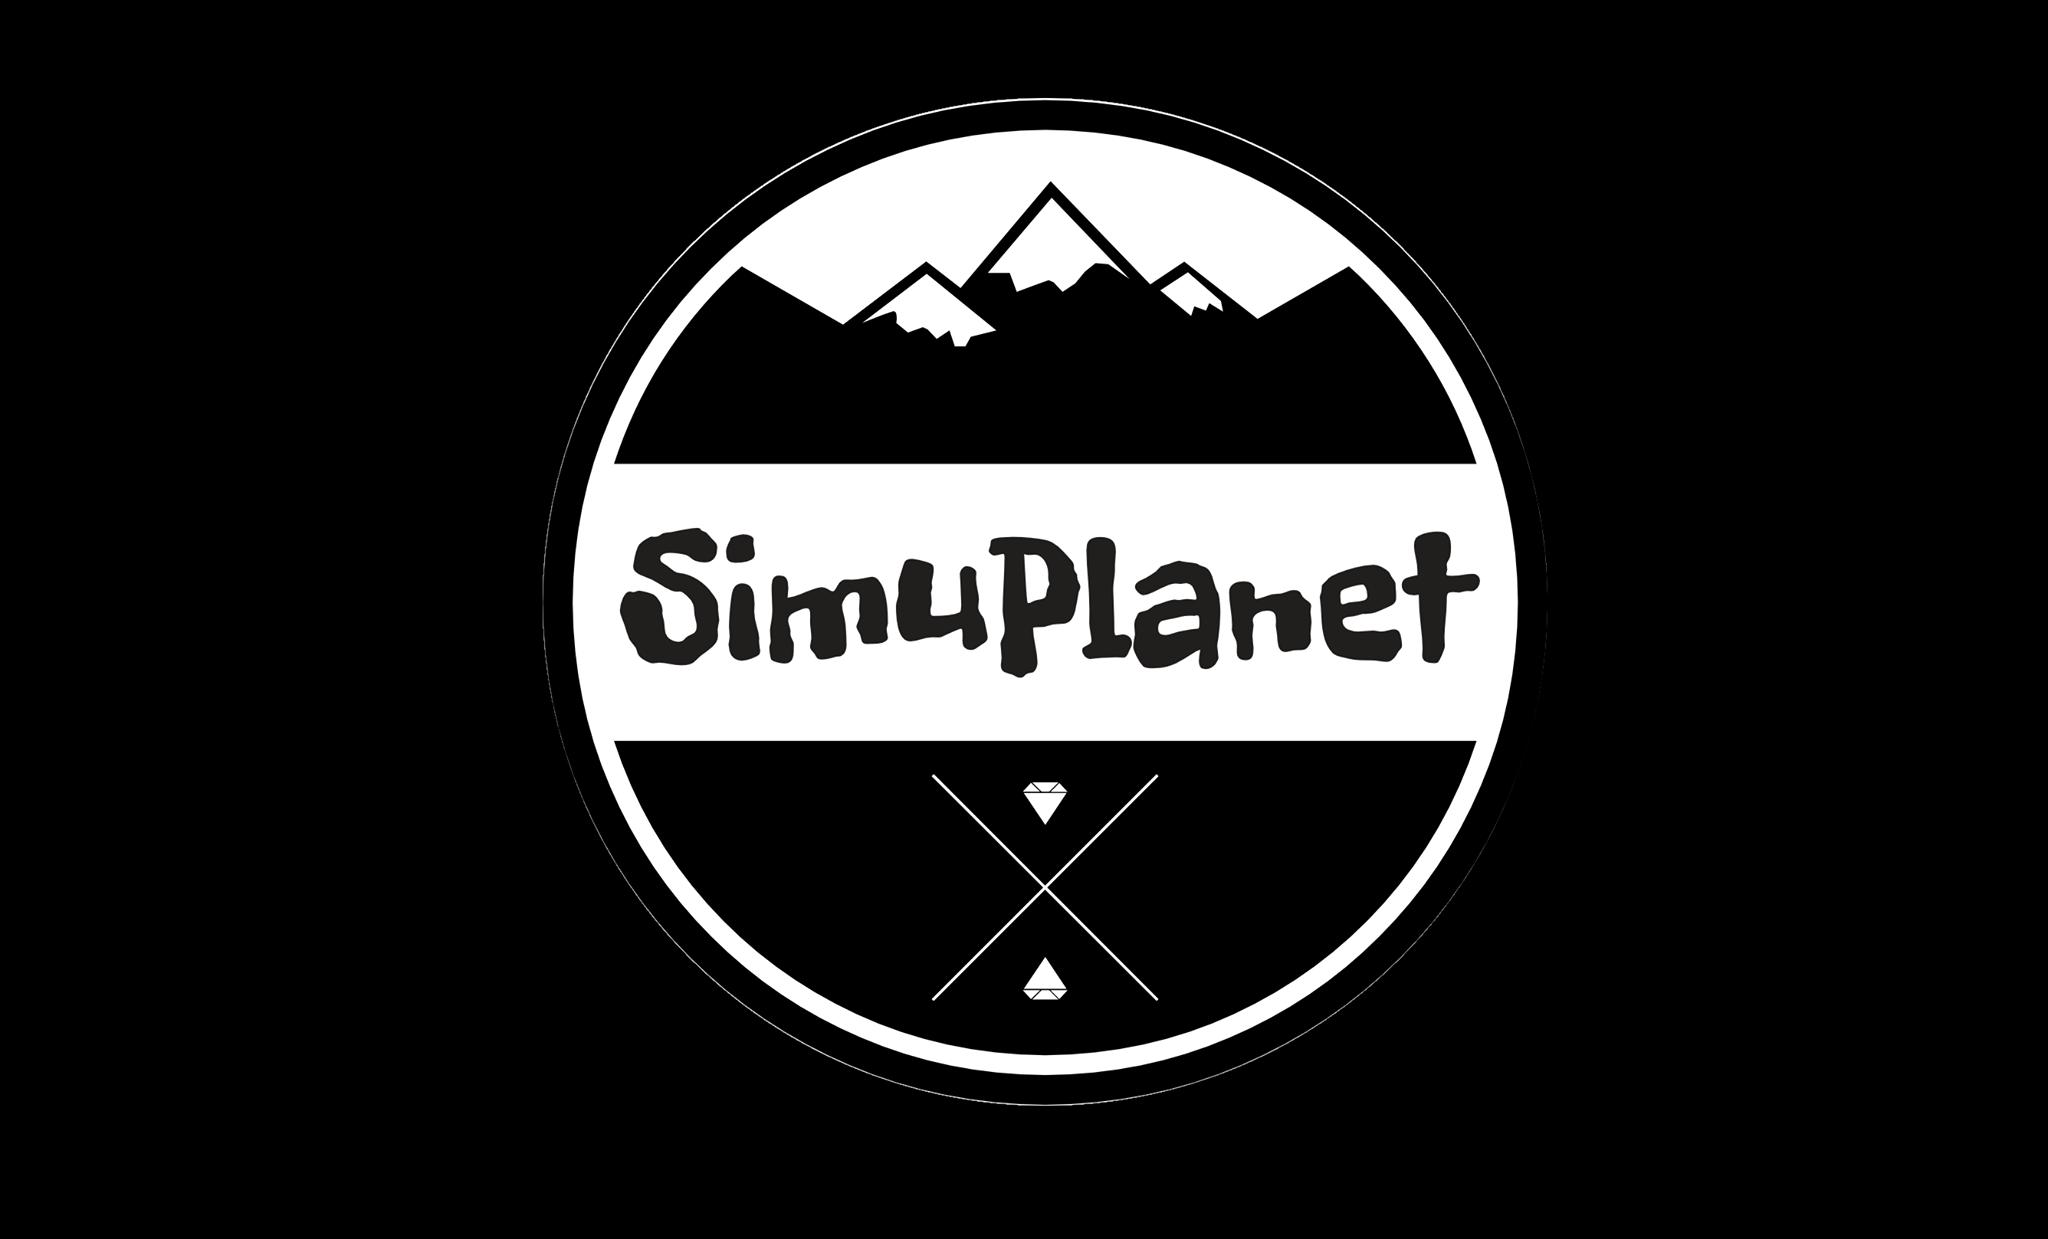 SimuPlanet